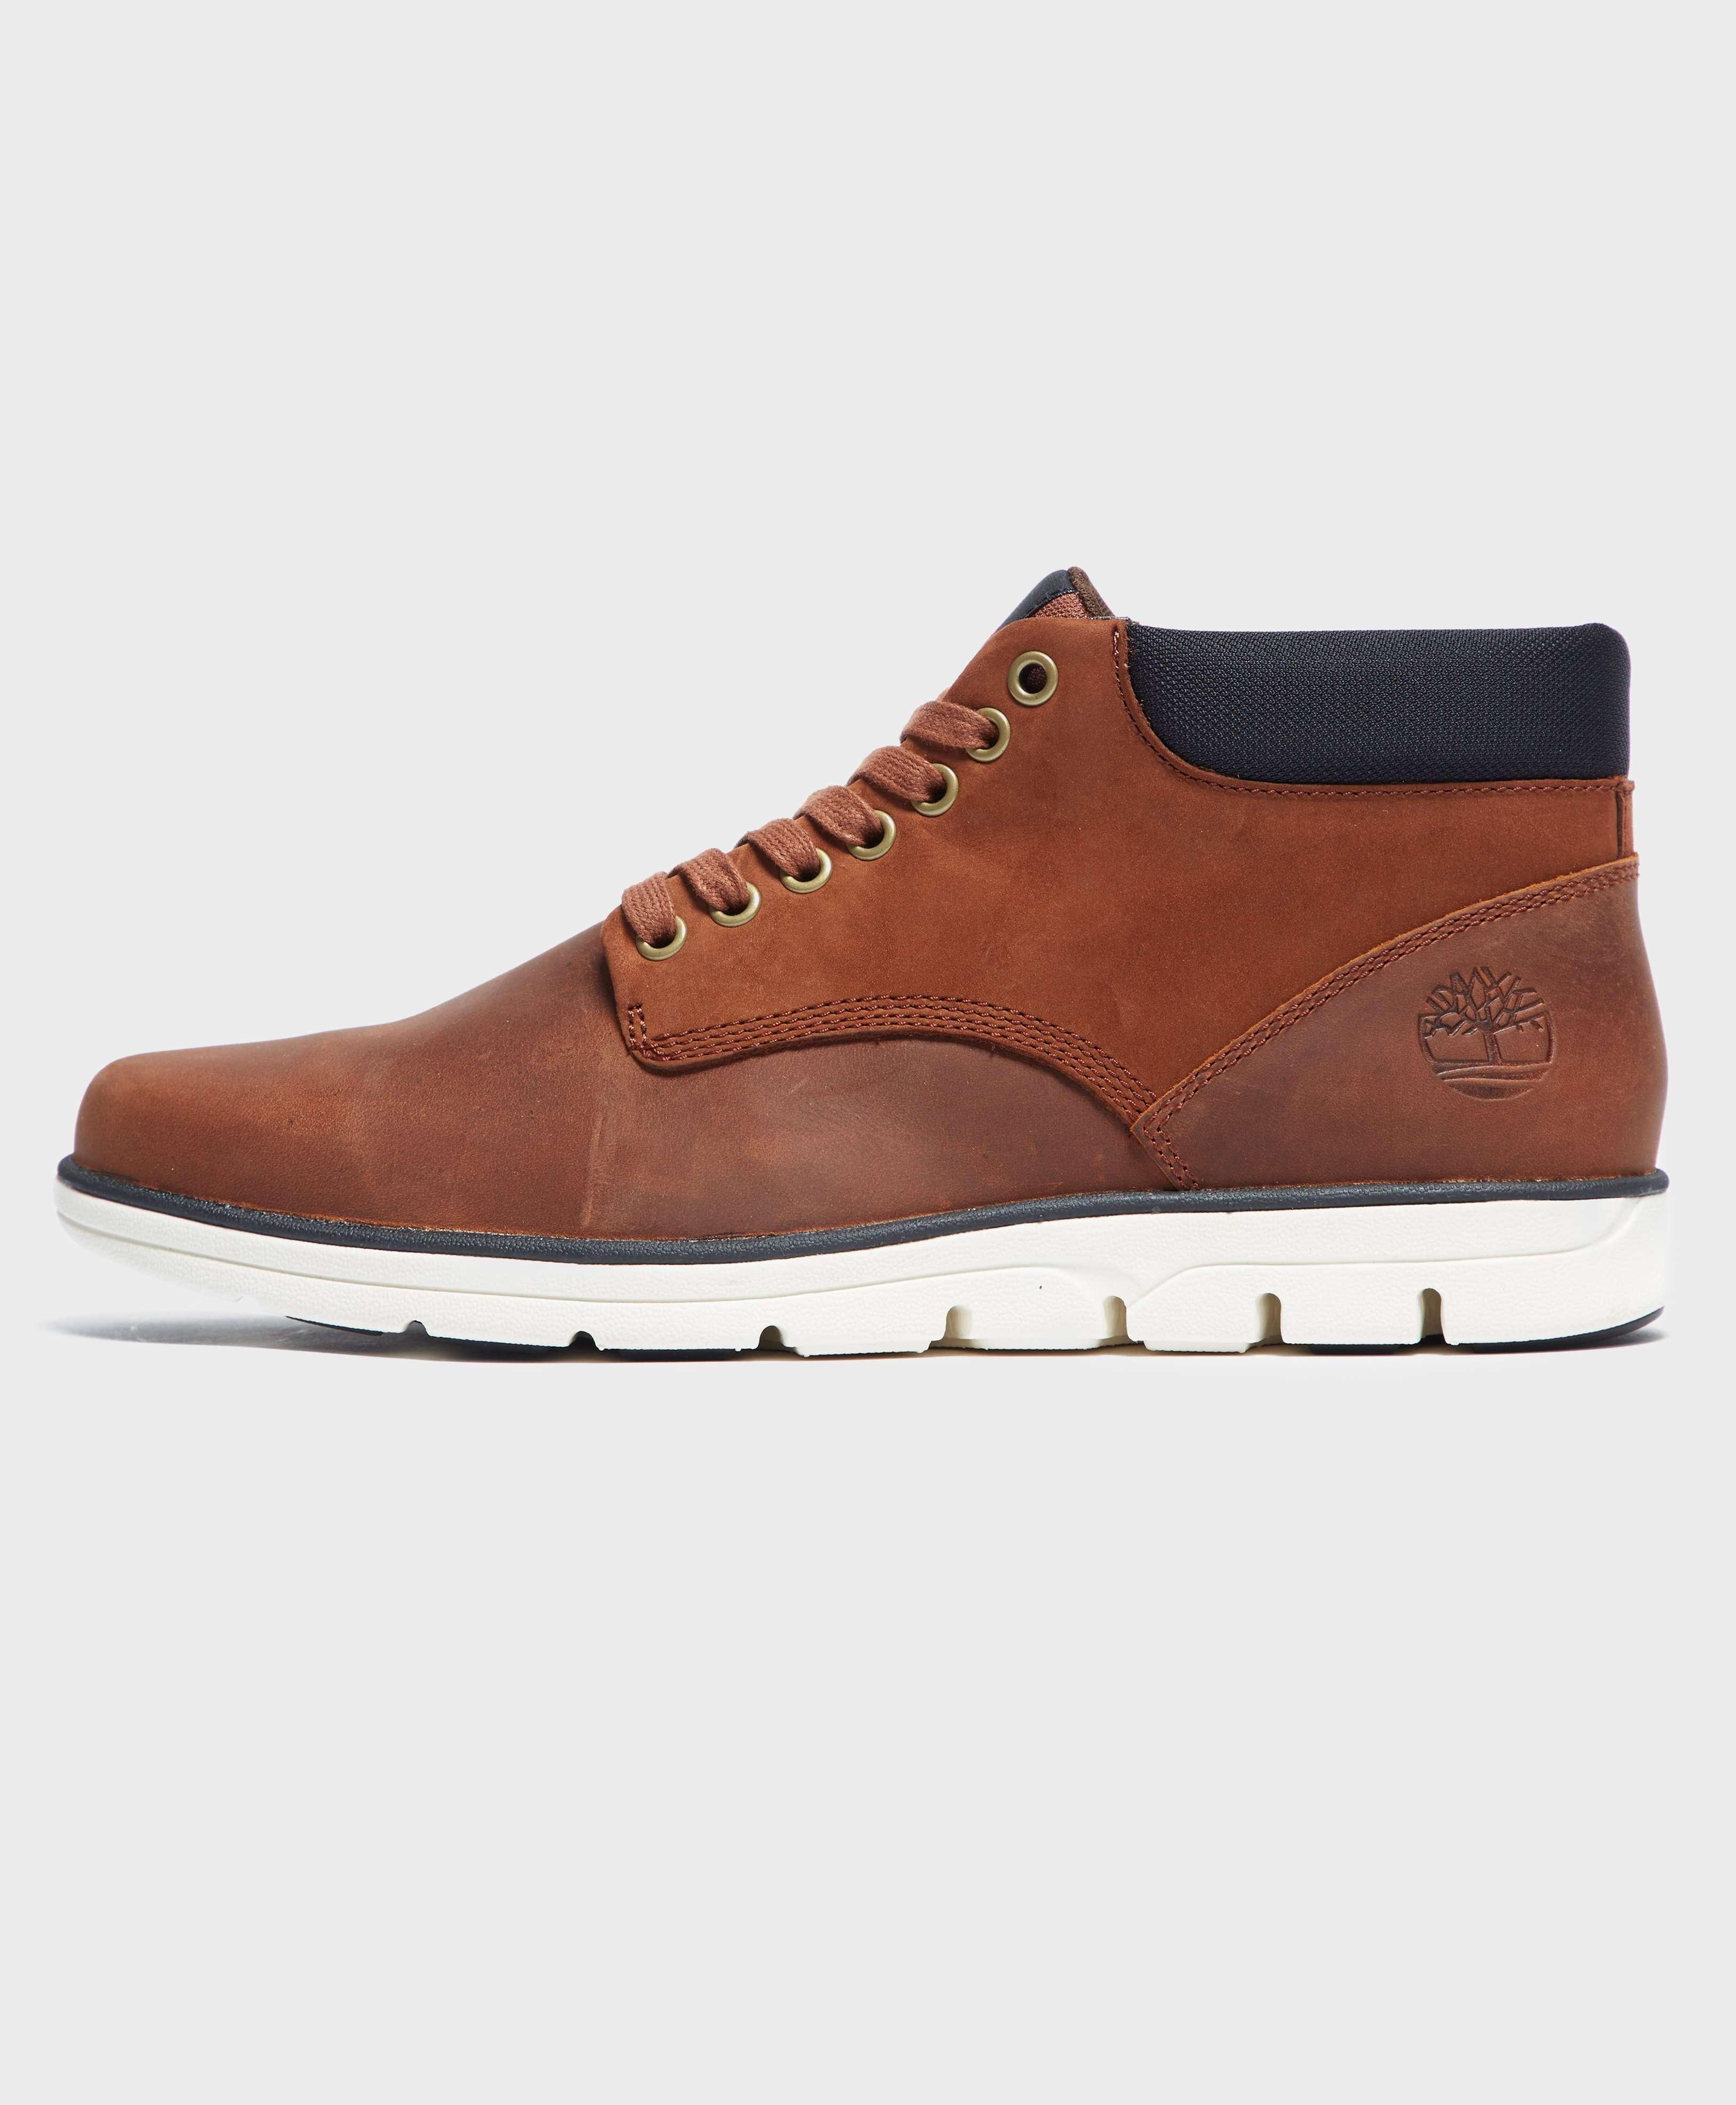 Timberland Bradstreet Chukka Boot